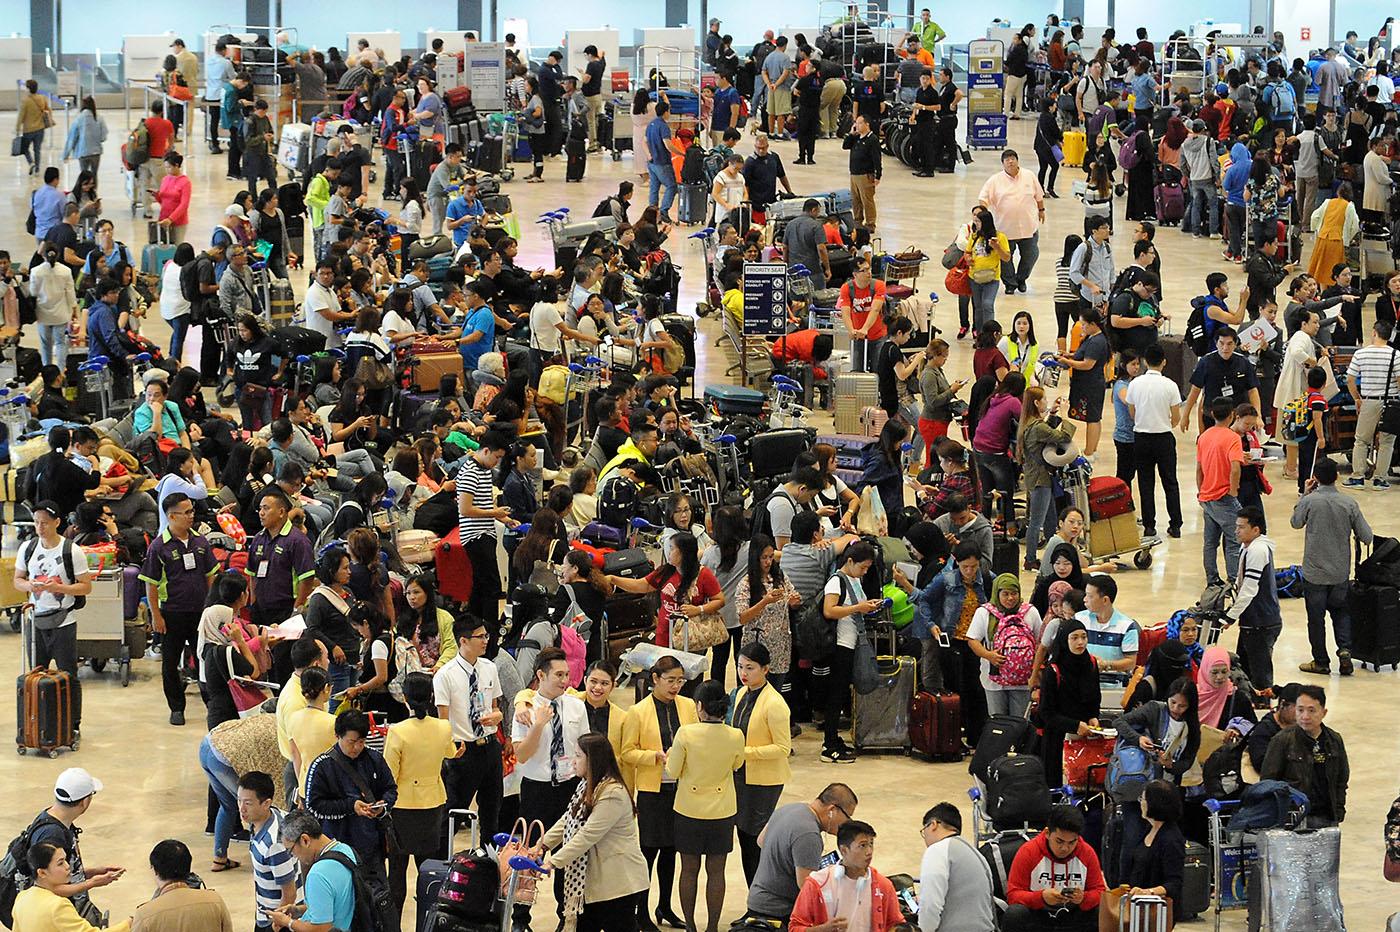 TIMELINE: Xiamen Air plane mishap at NAIA runway